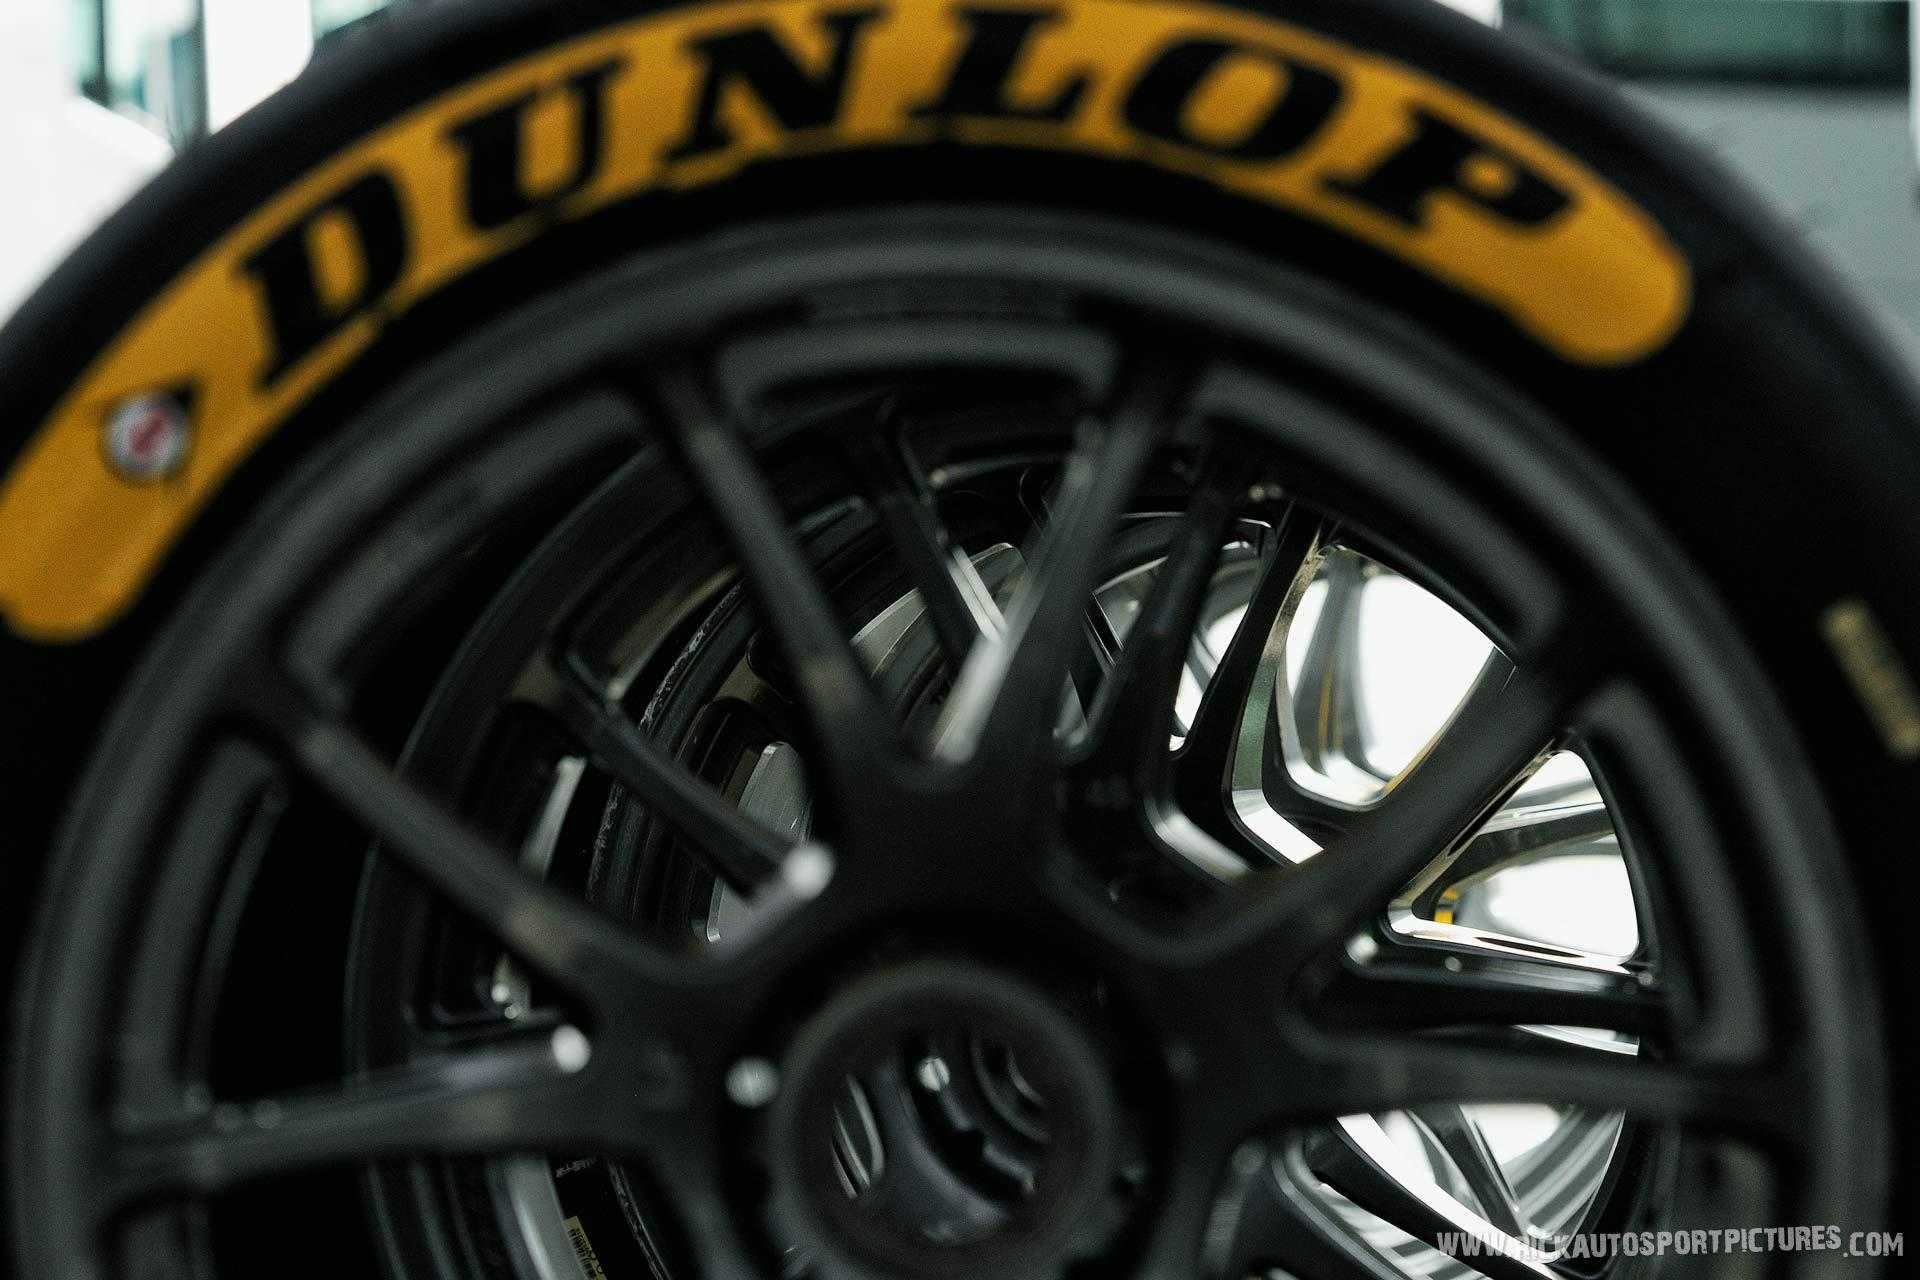 Dunlop silverstone 2017